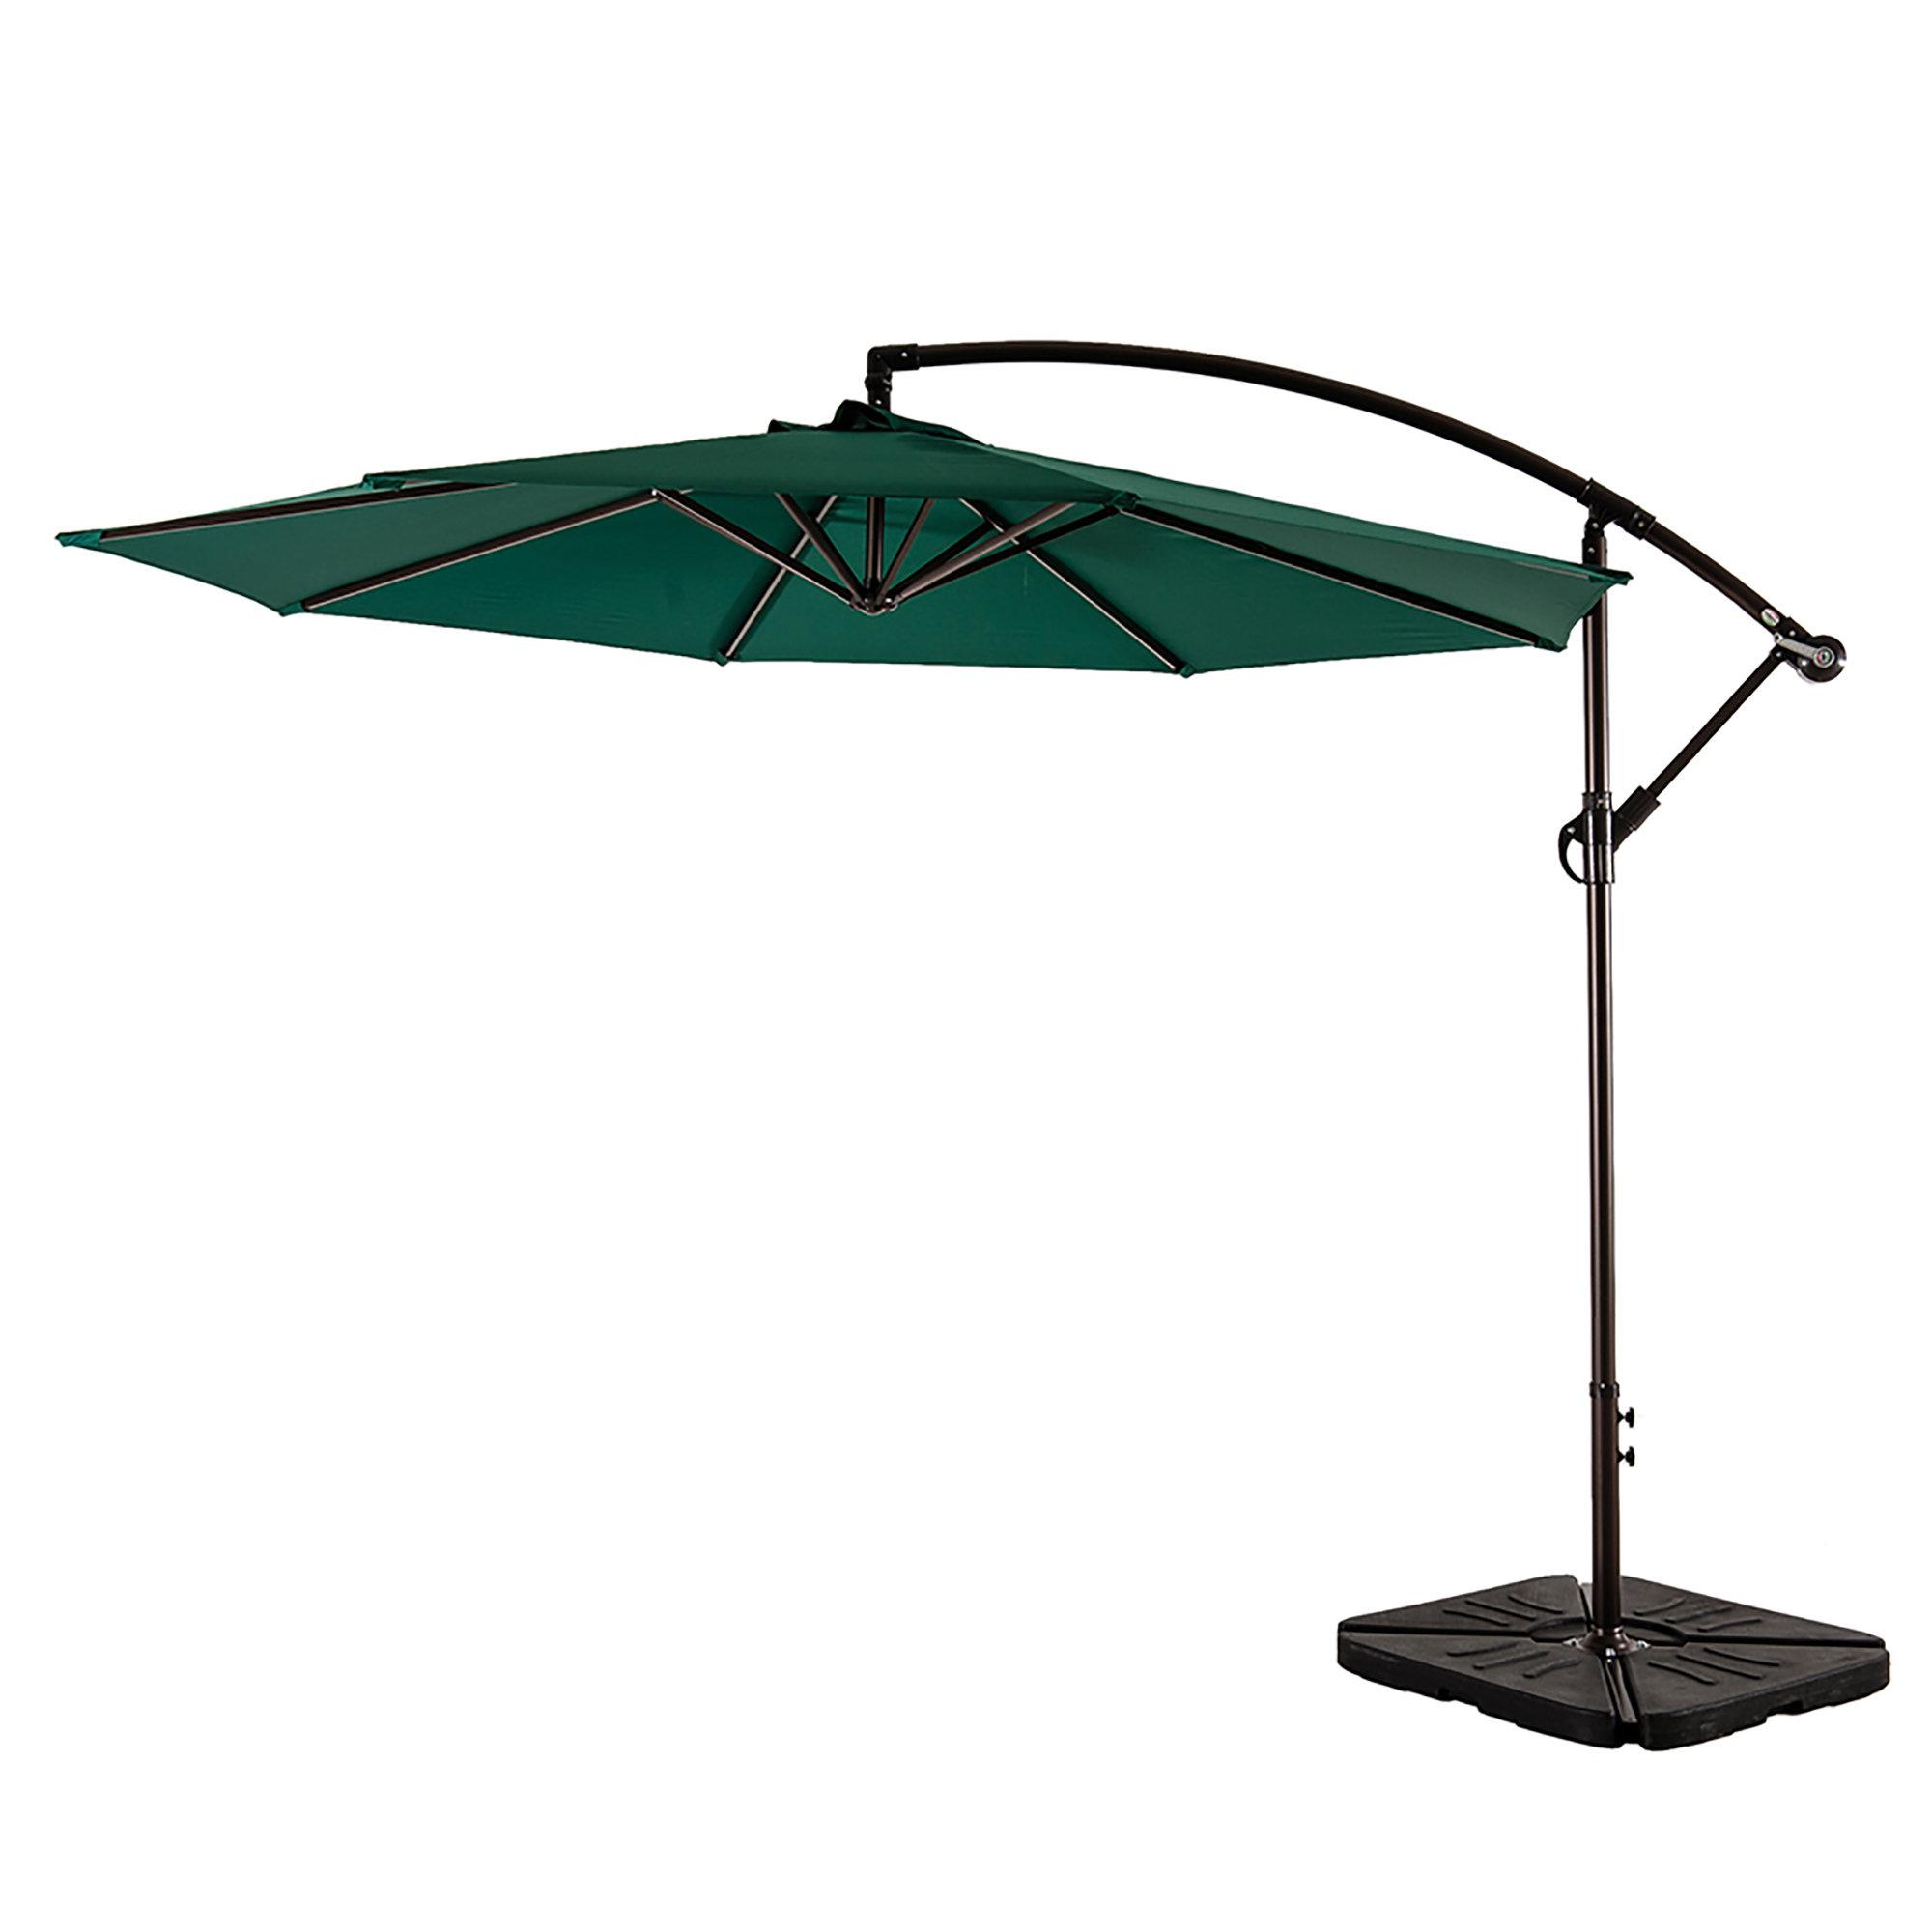 Karr 10' Cantilever Umbrella In Most Recent Trotman Cantilever Umbrellas (Gallery 6 of 20)